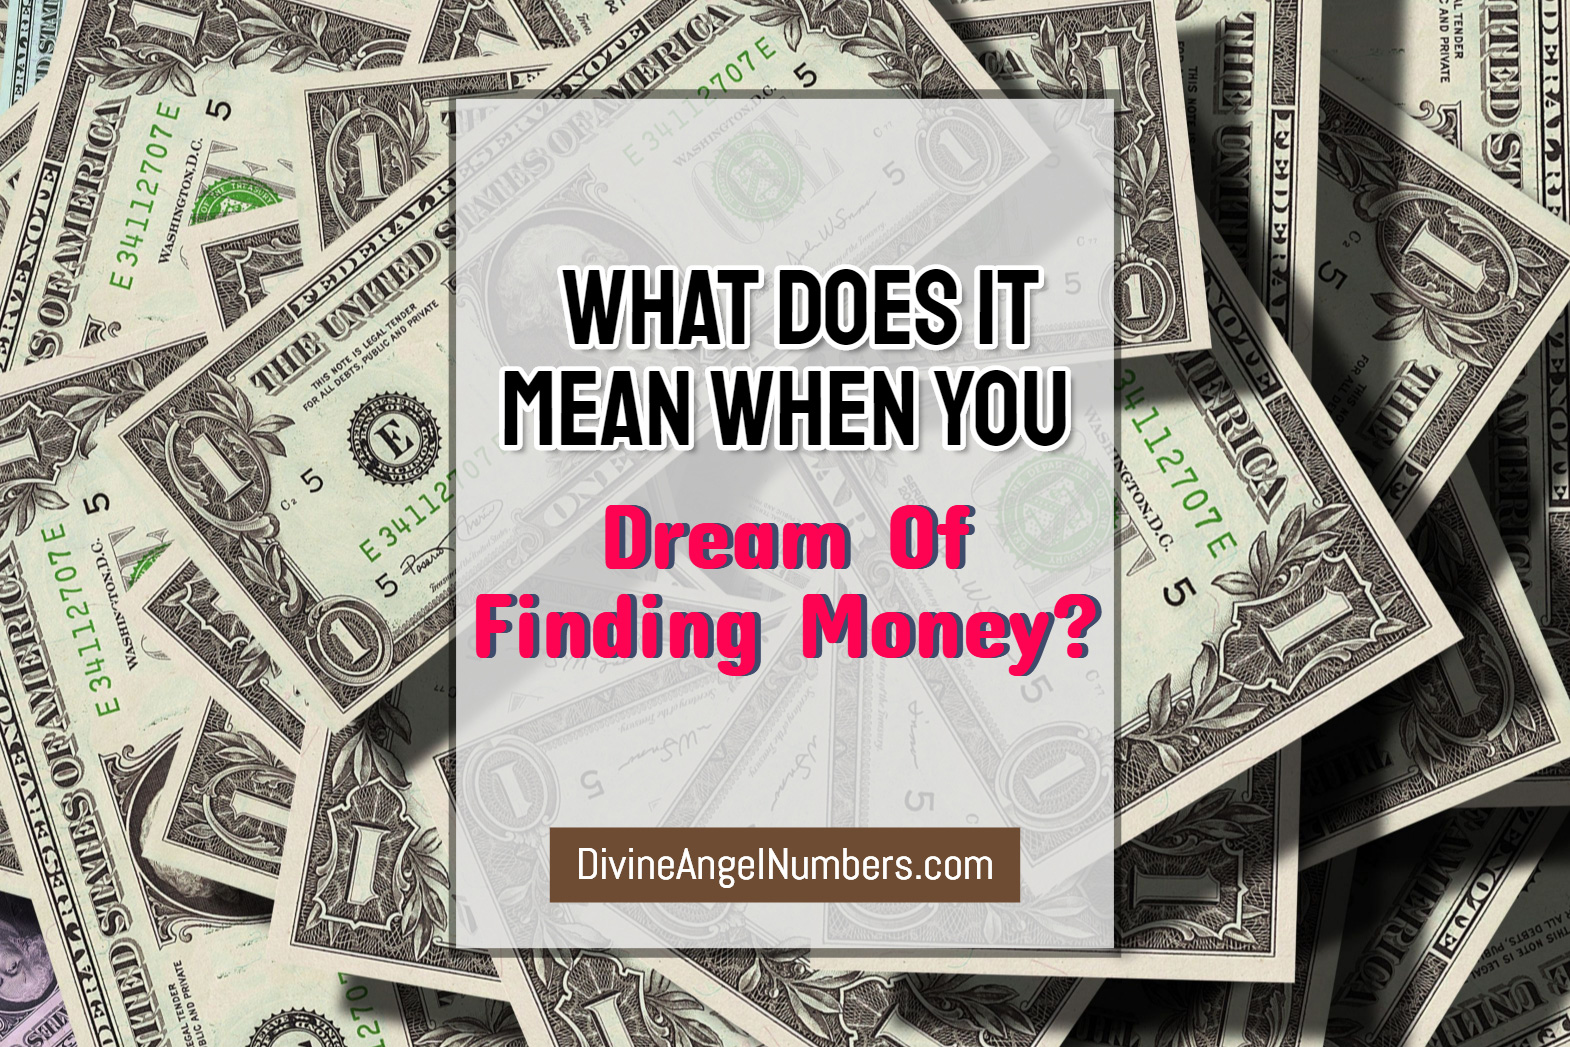 Dream Of Finding Money?